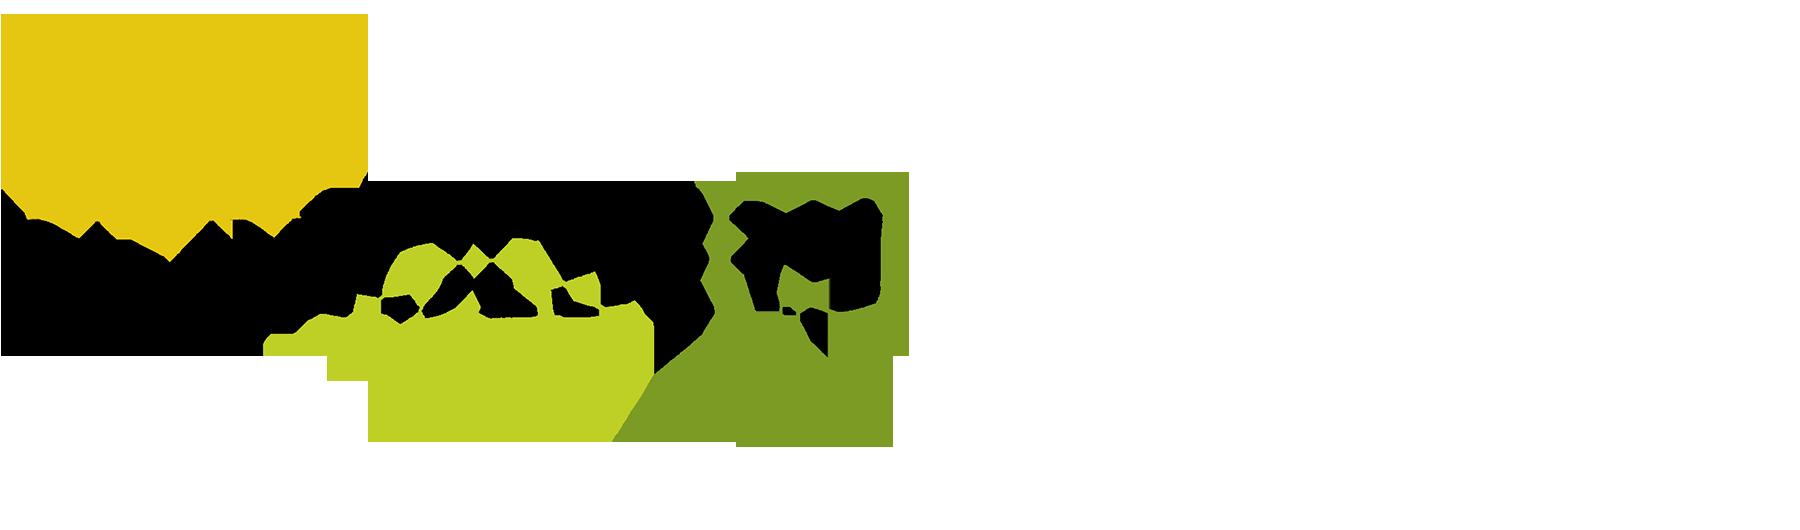 DeBroederij-logo-variant-4agendapagina